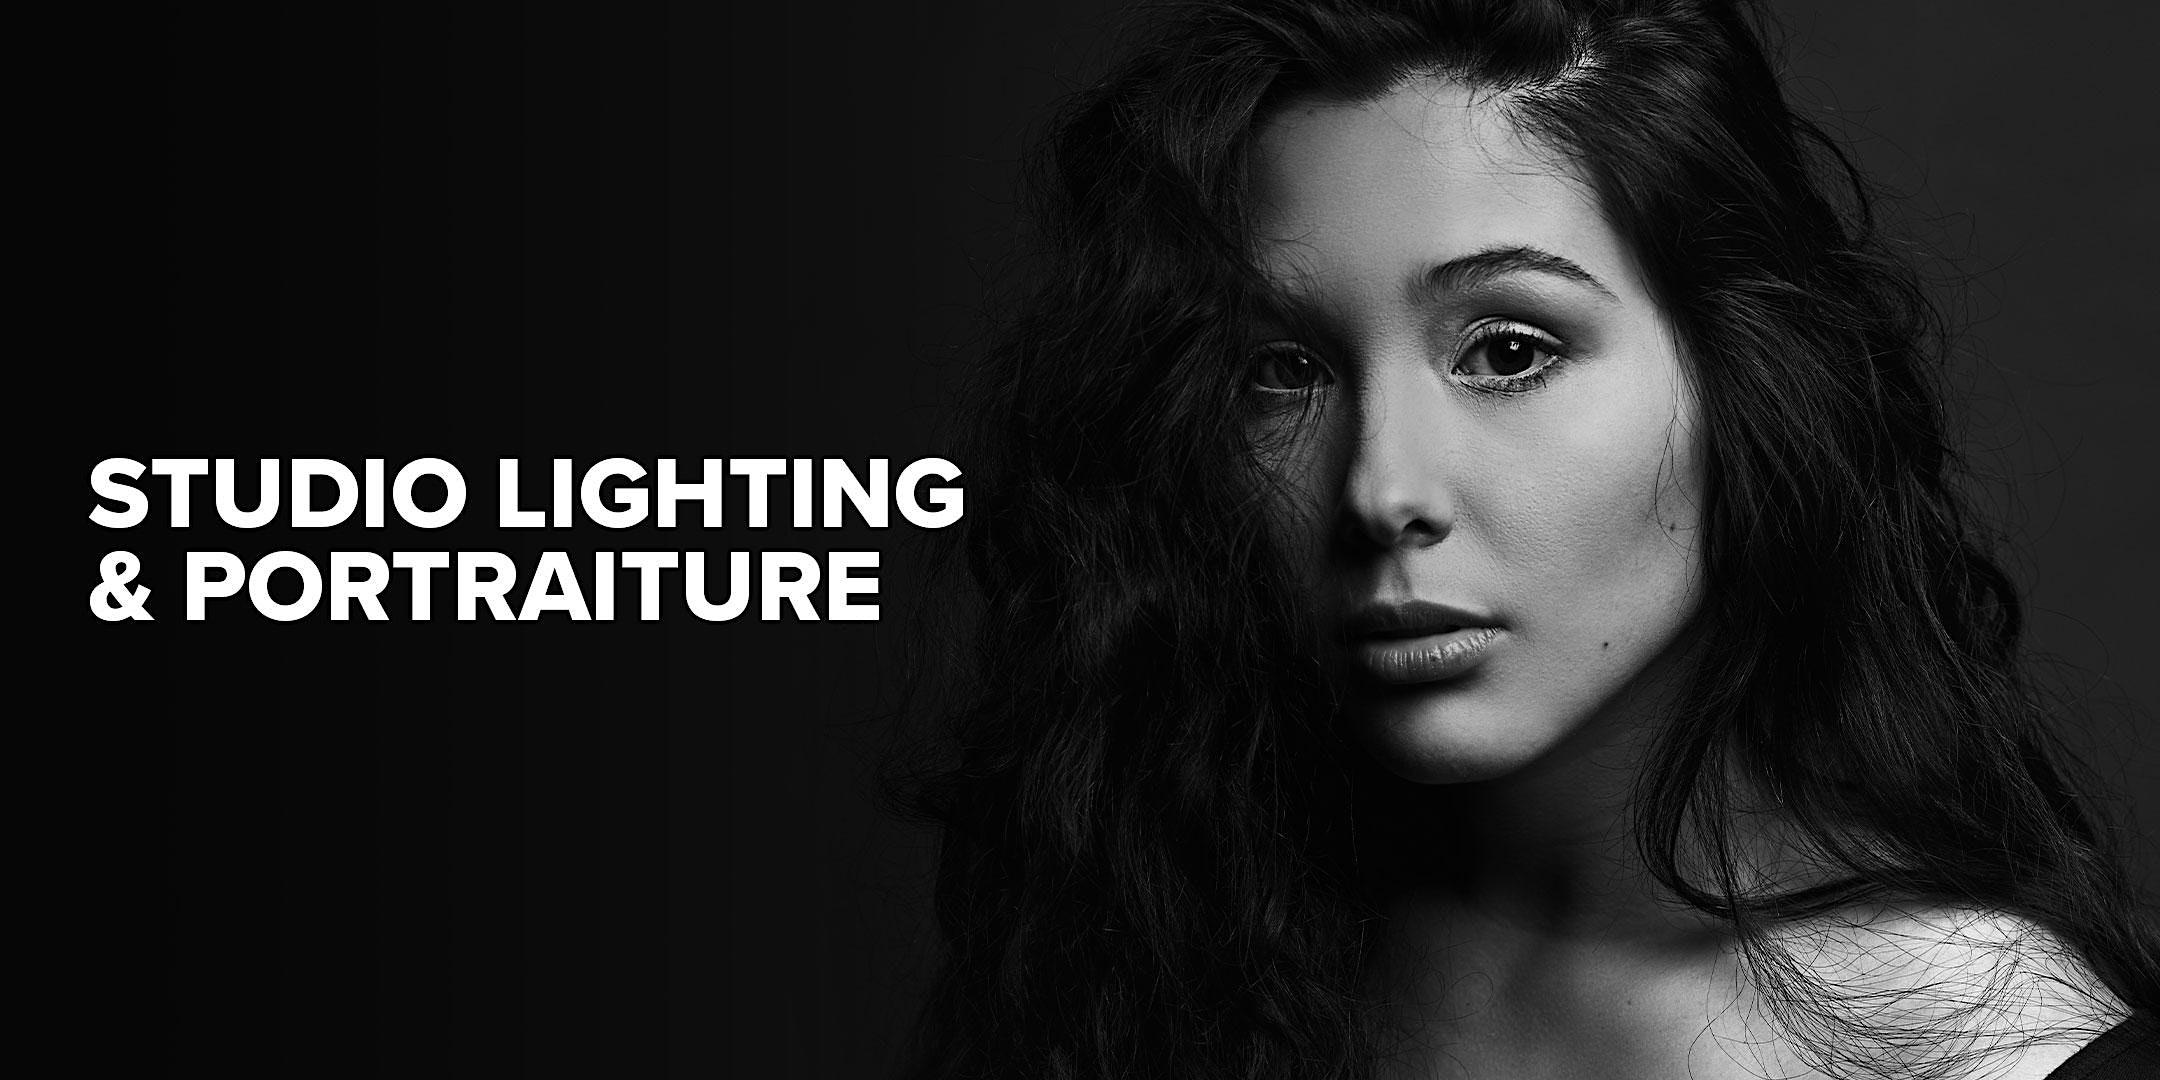 Studio Lighting and Portraiture